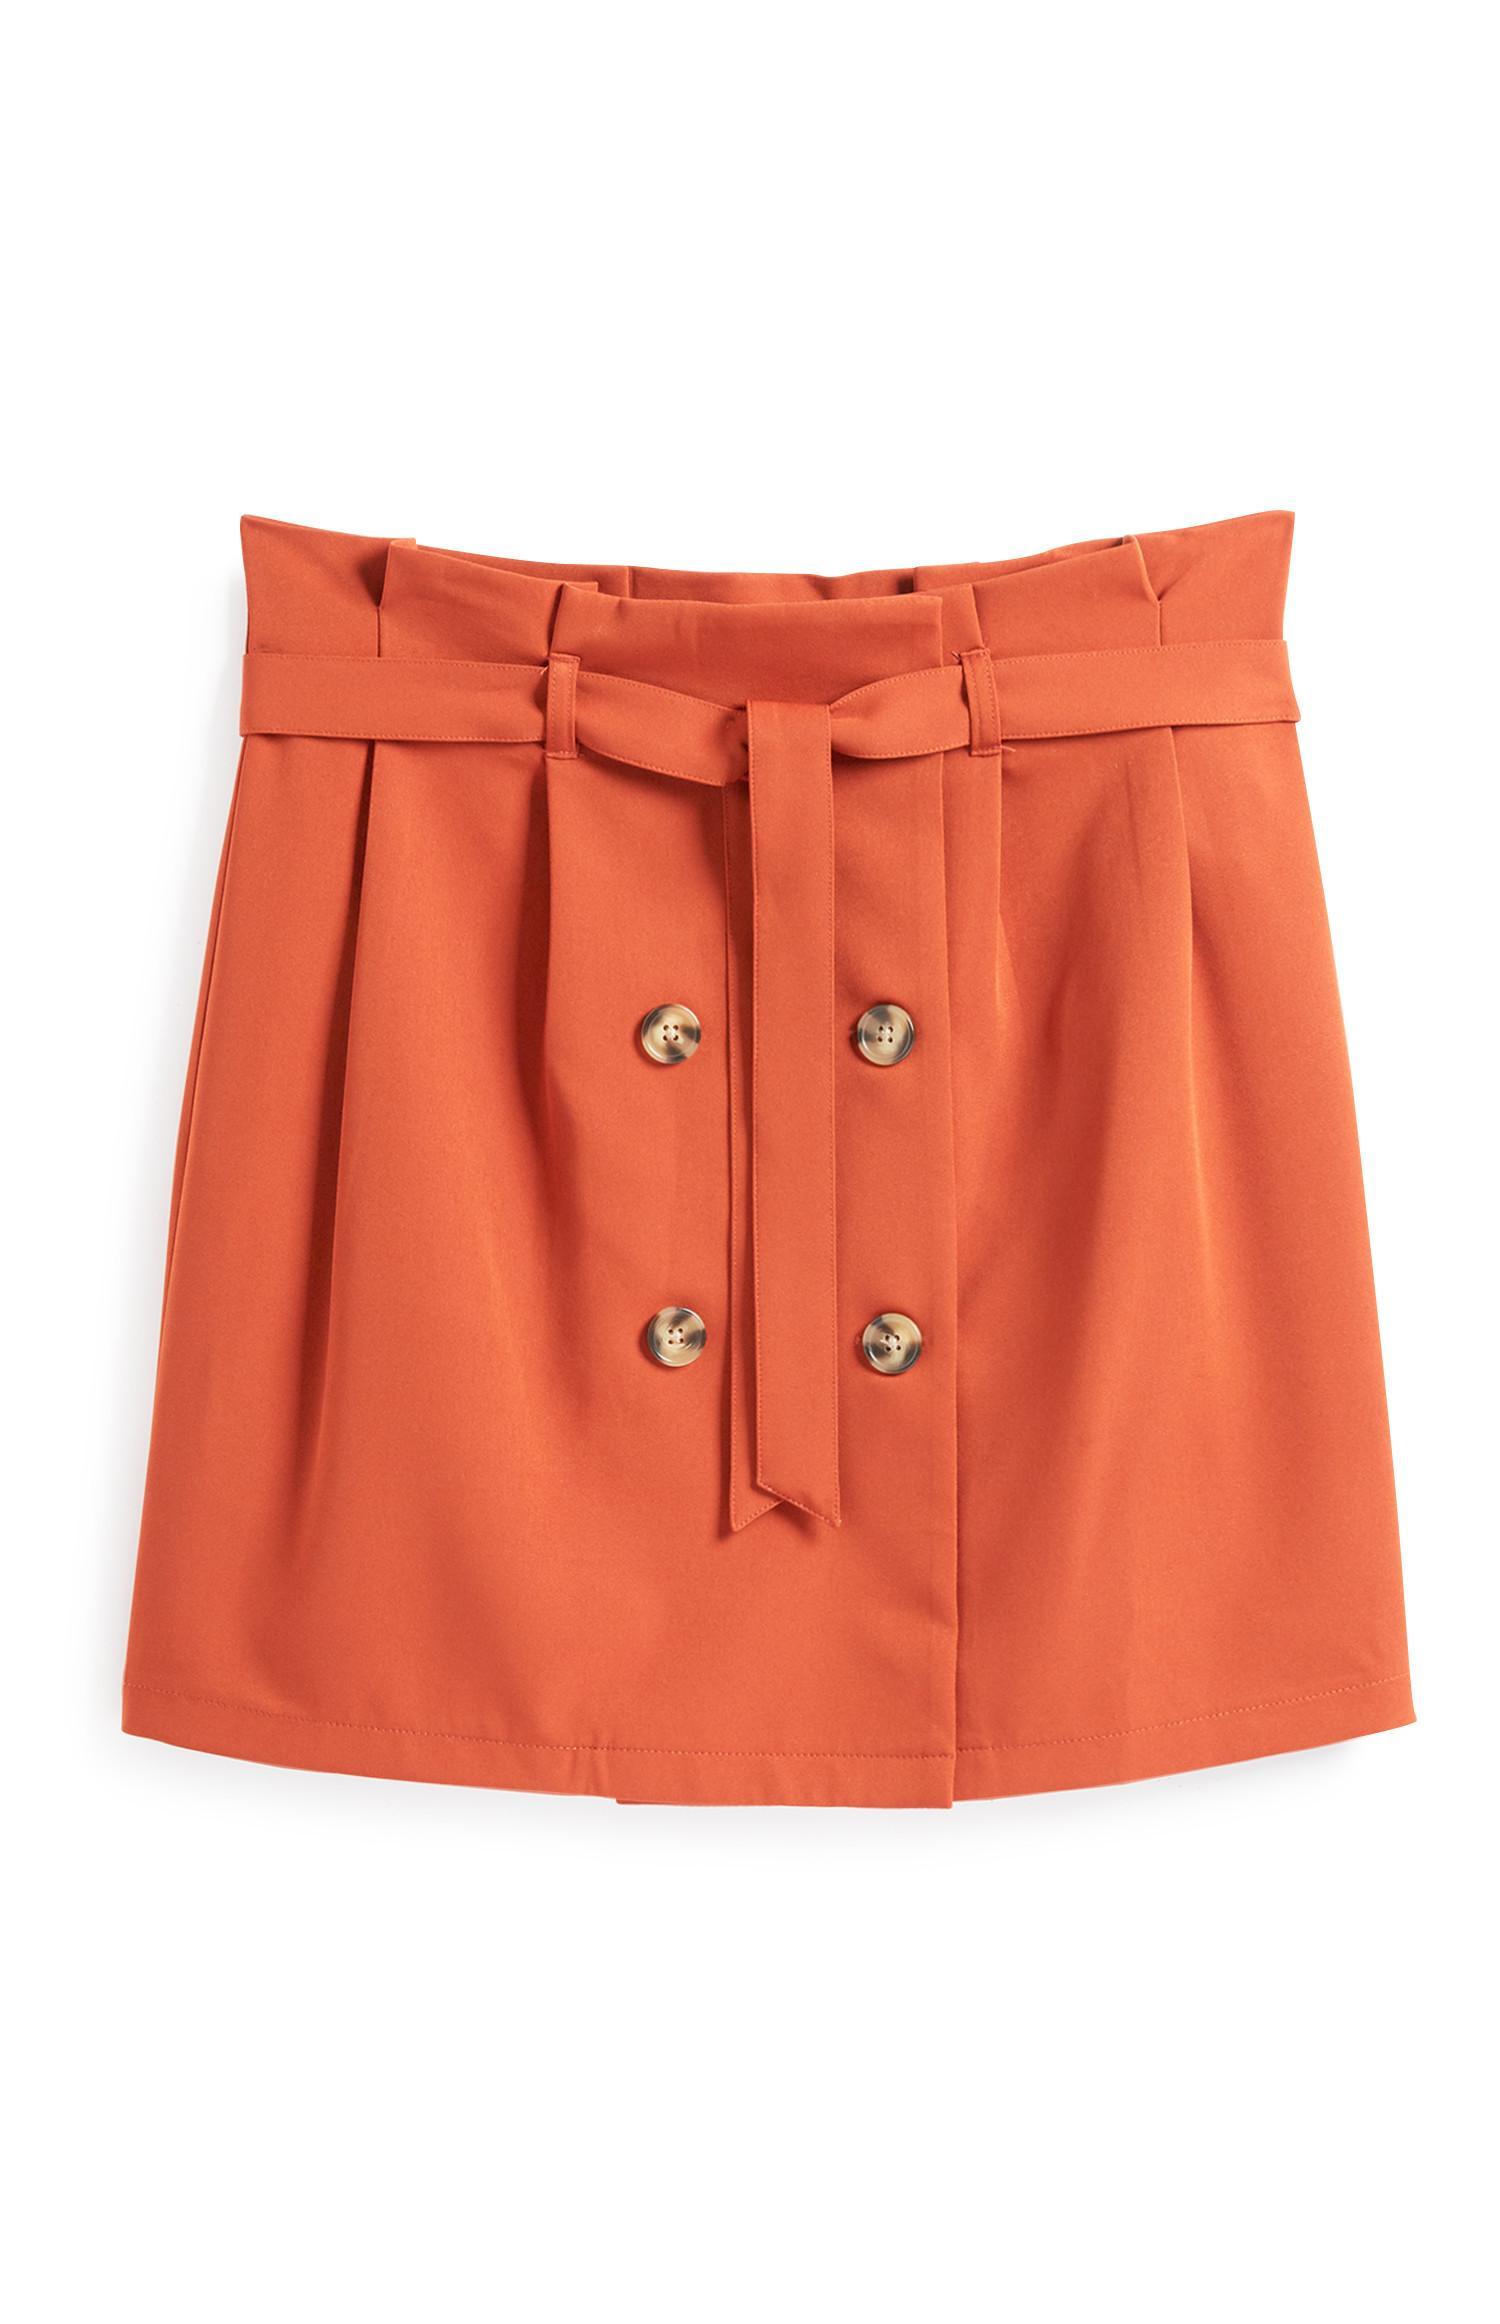 Orangefarbener Rock mit Gürtel